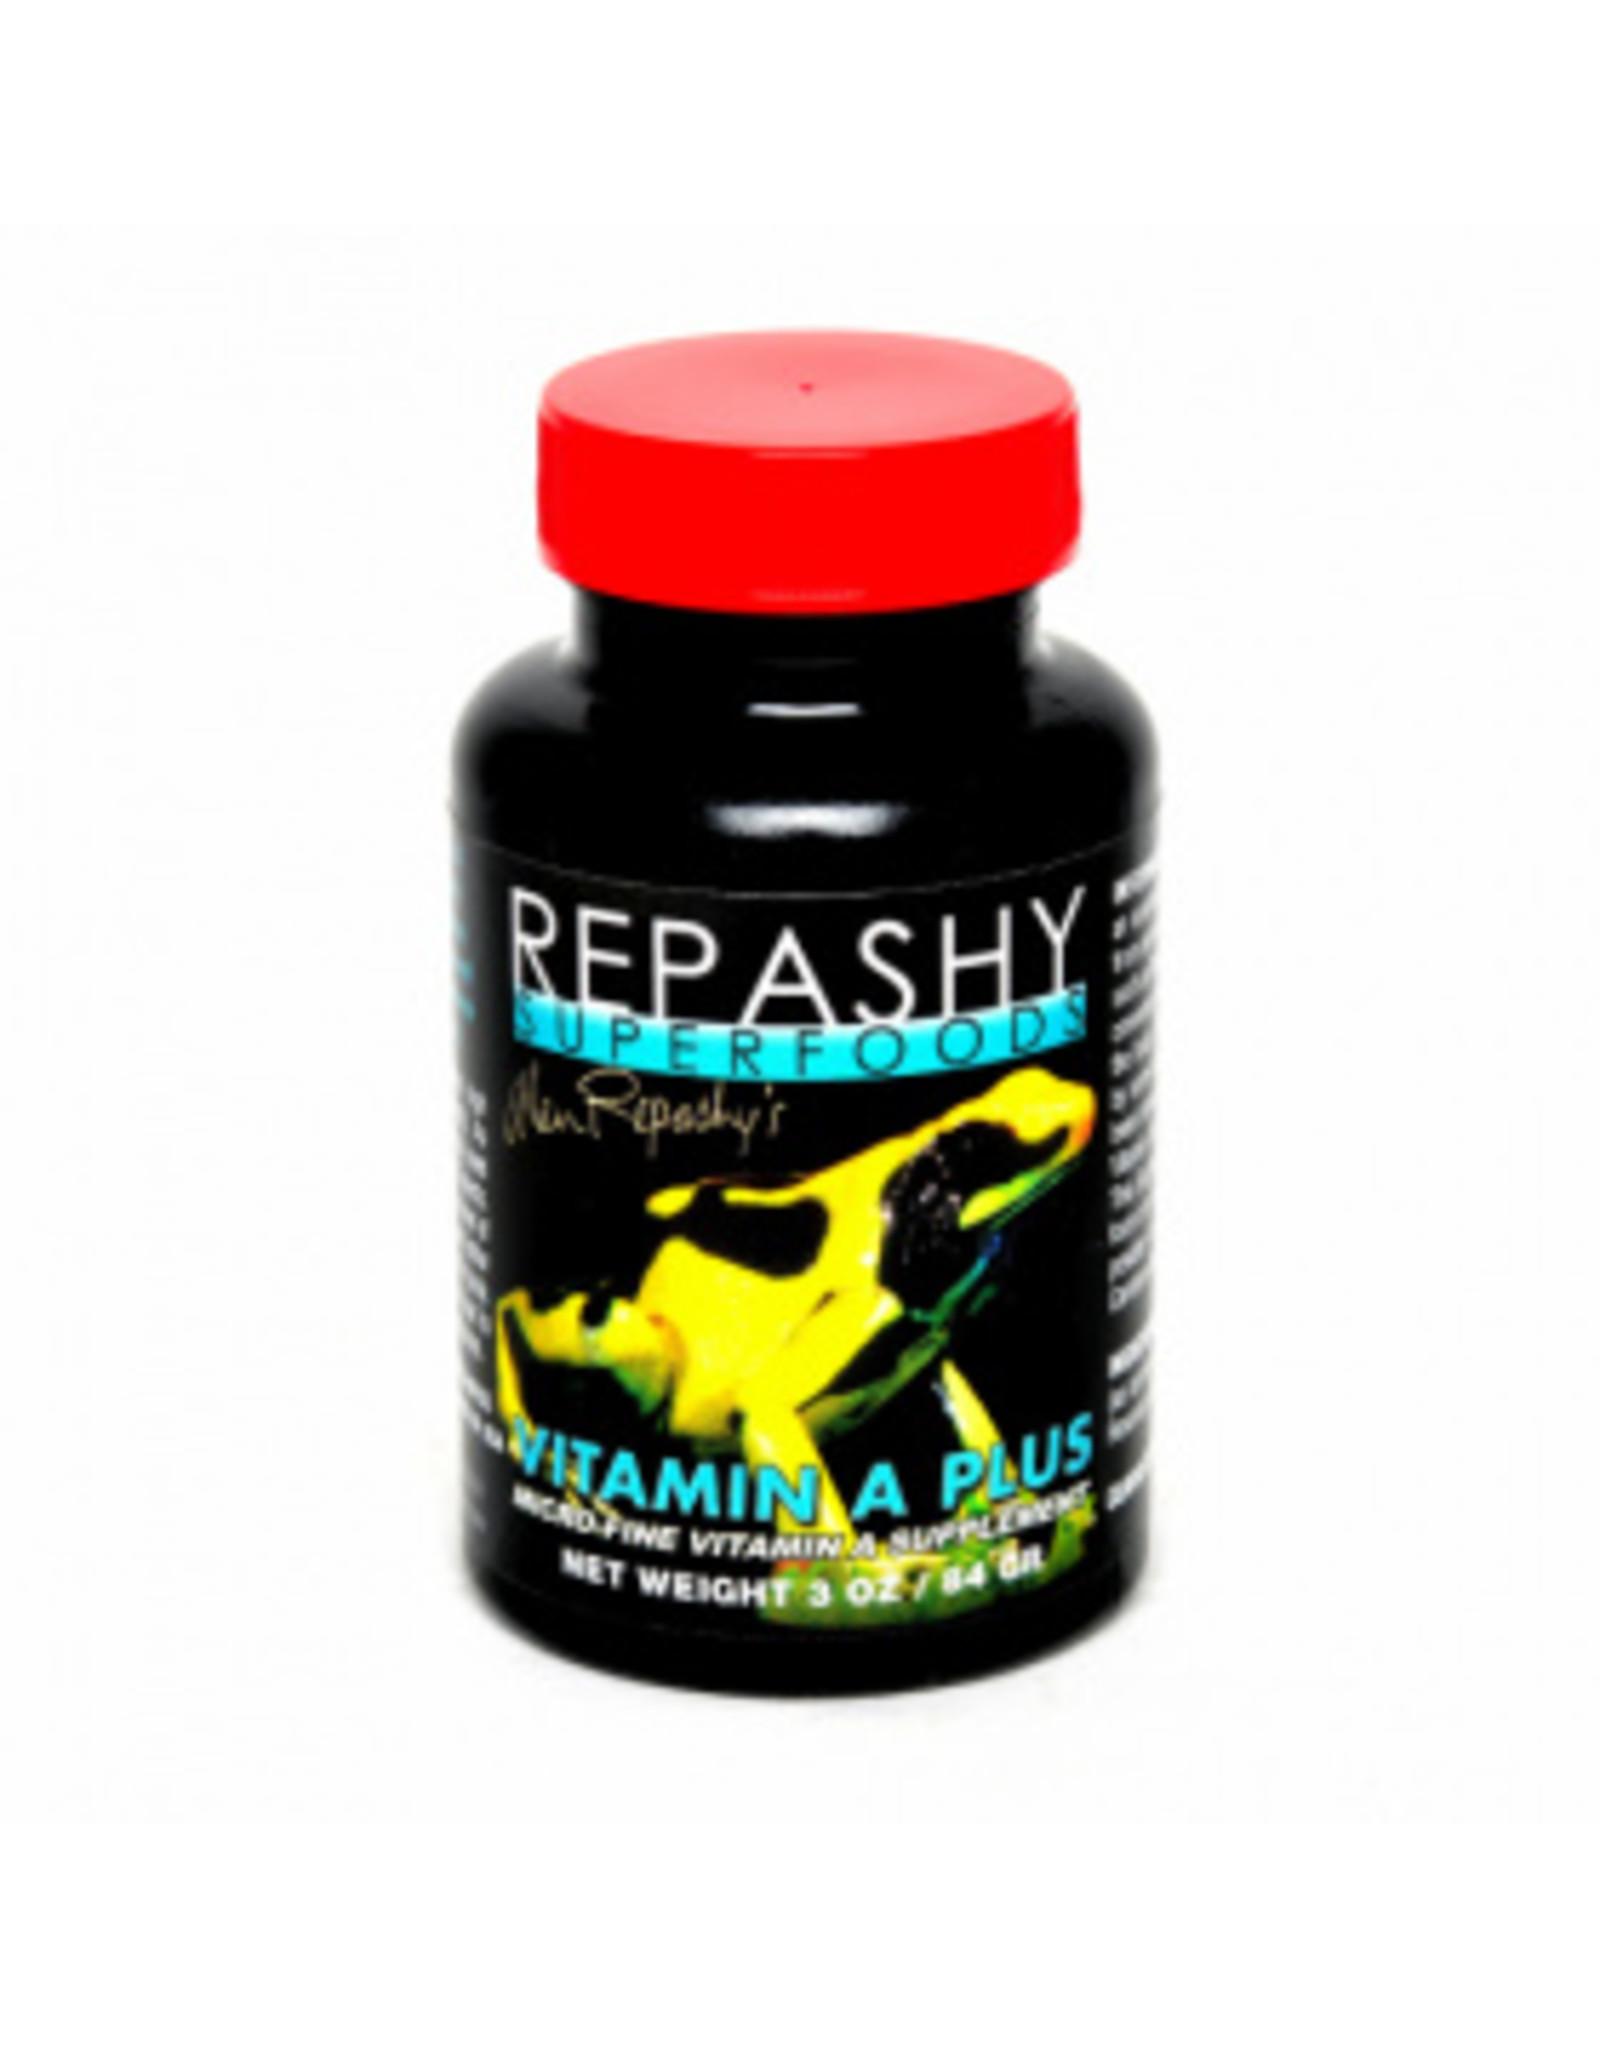 Repashy REPASHY Vitamin A Plus